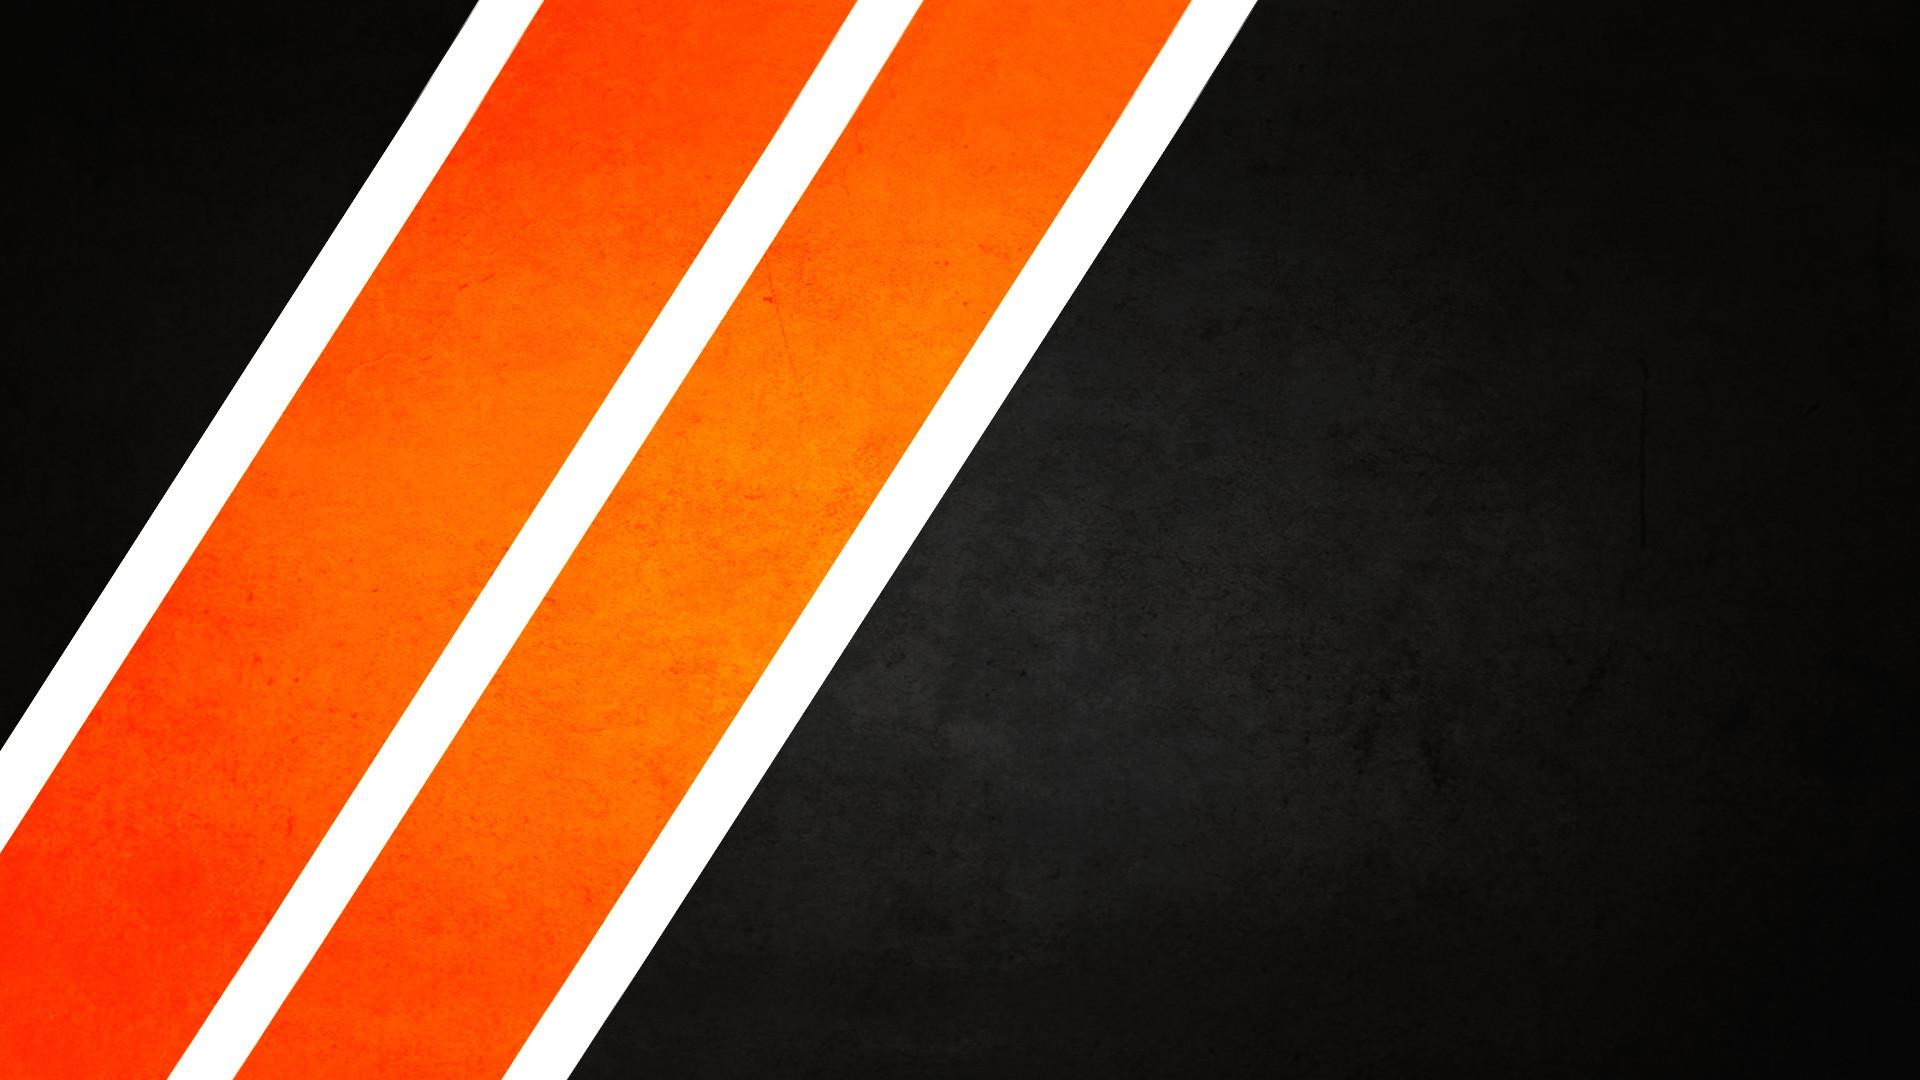 Orange Abstract Pic